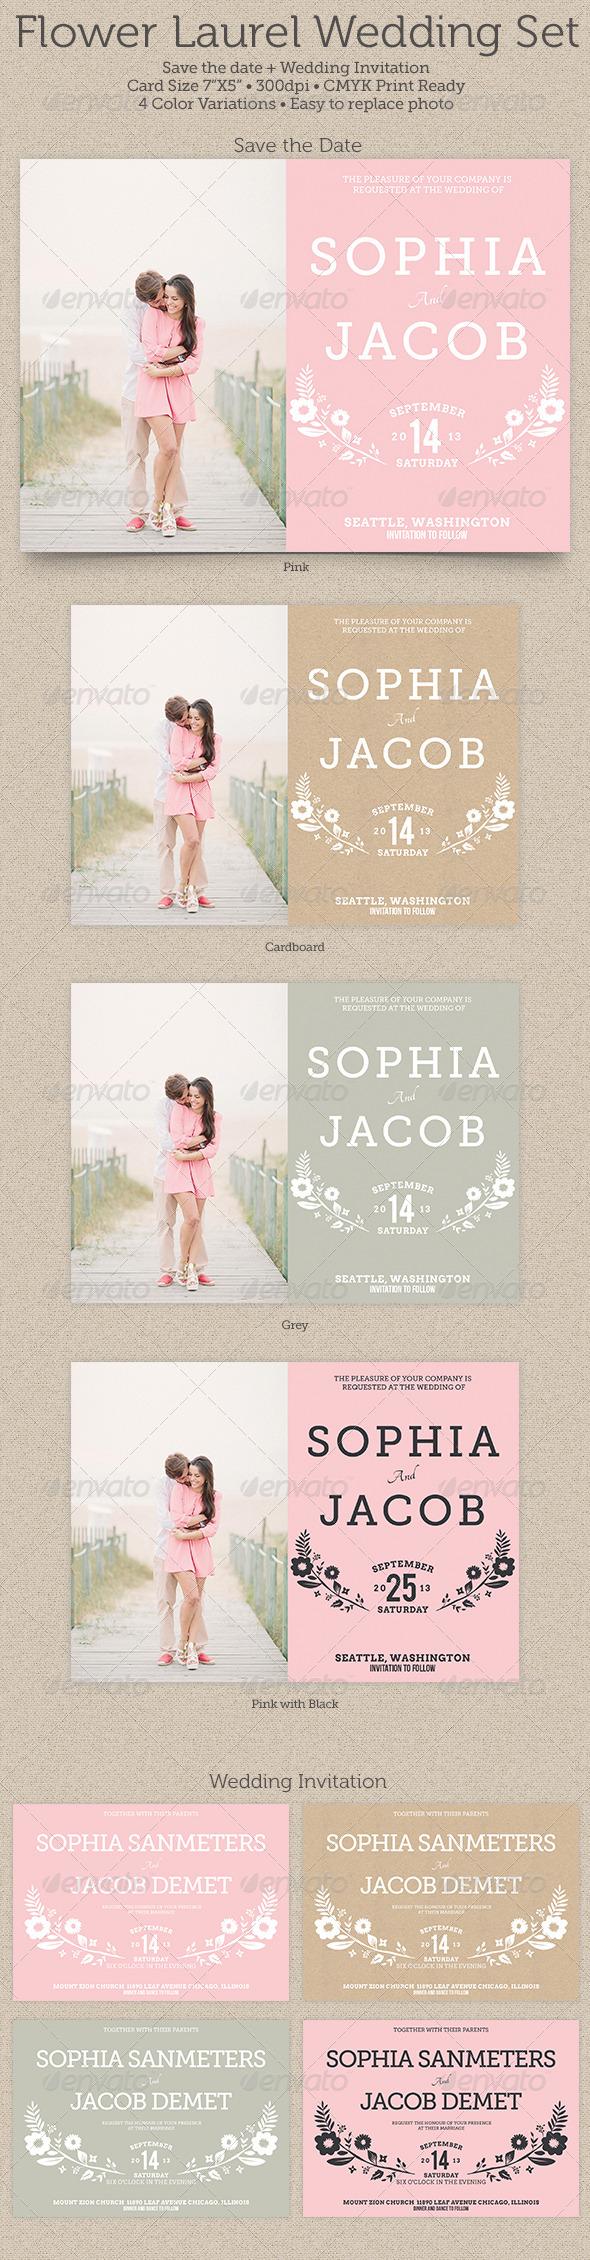 GraphicRiver Flower Laurel Wedding Set 4731538